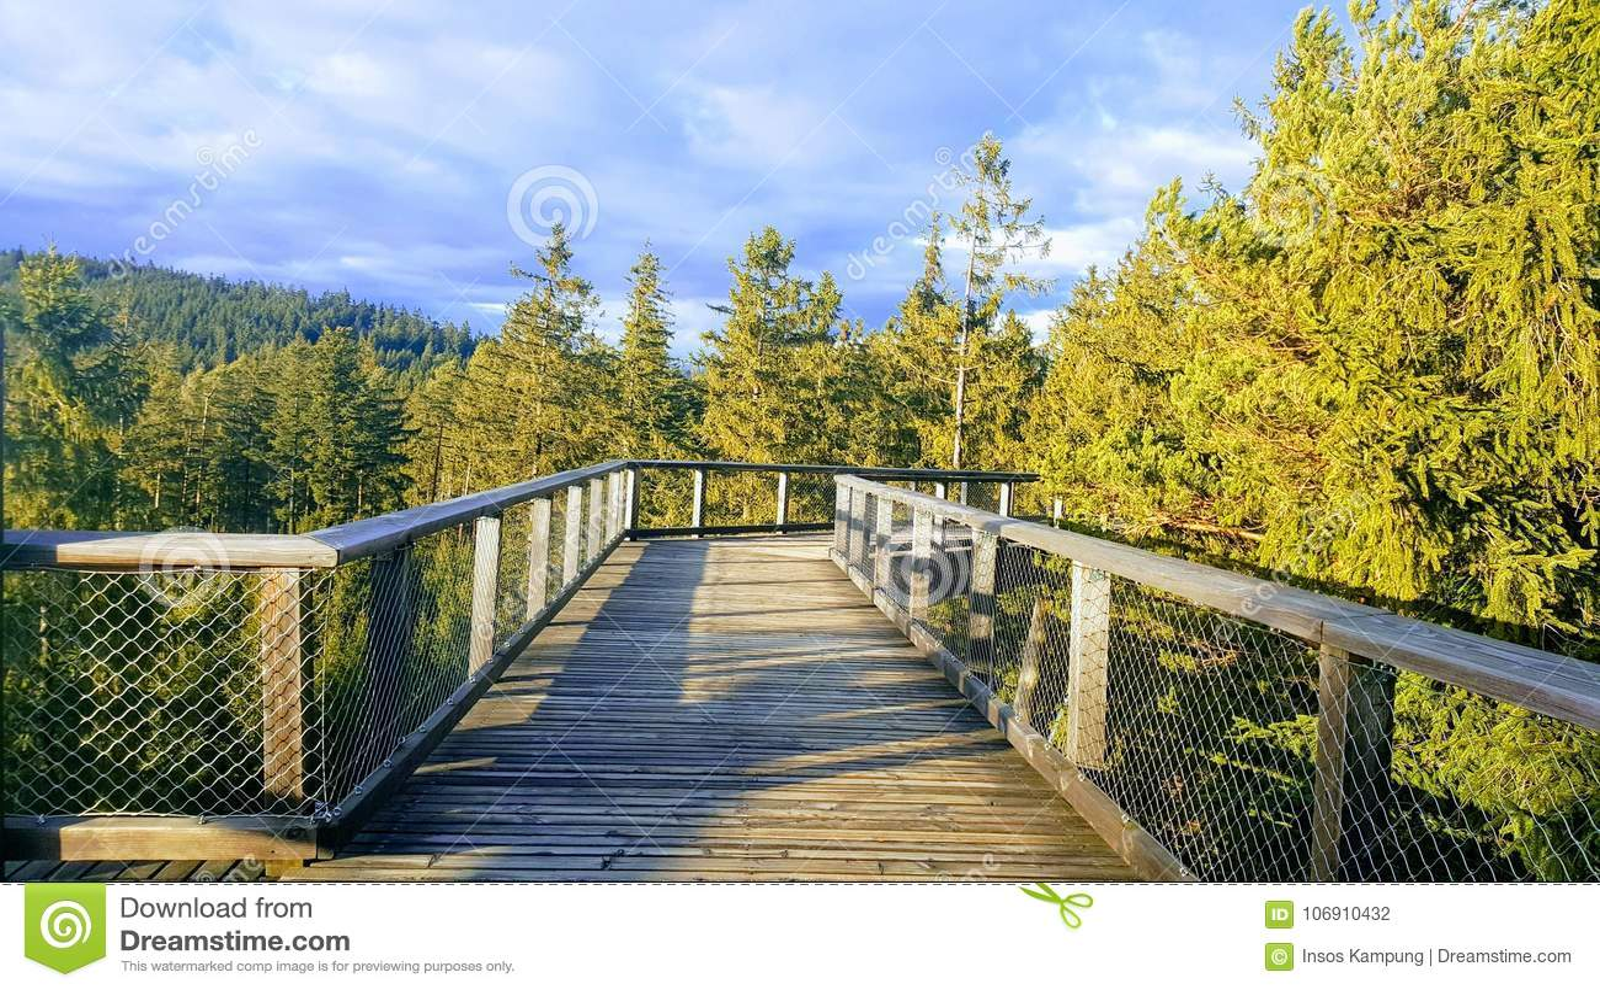 The Trail Trees Lipno Lookout, Czechia